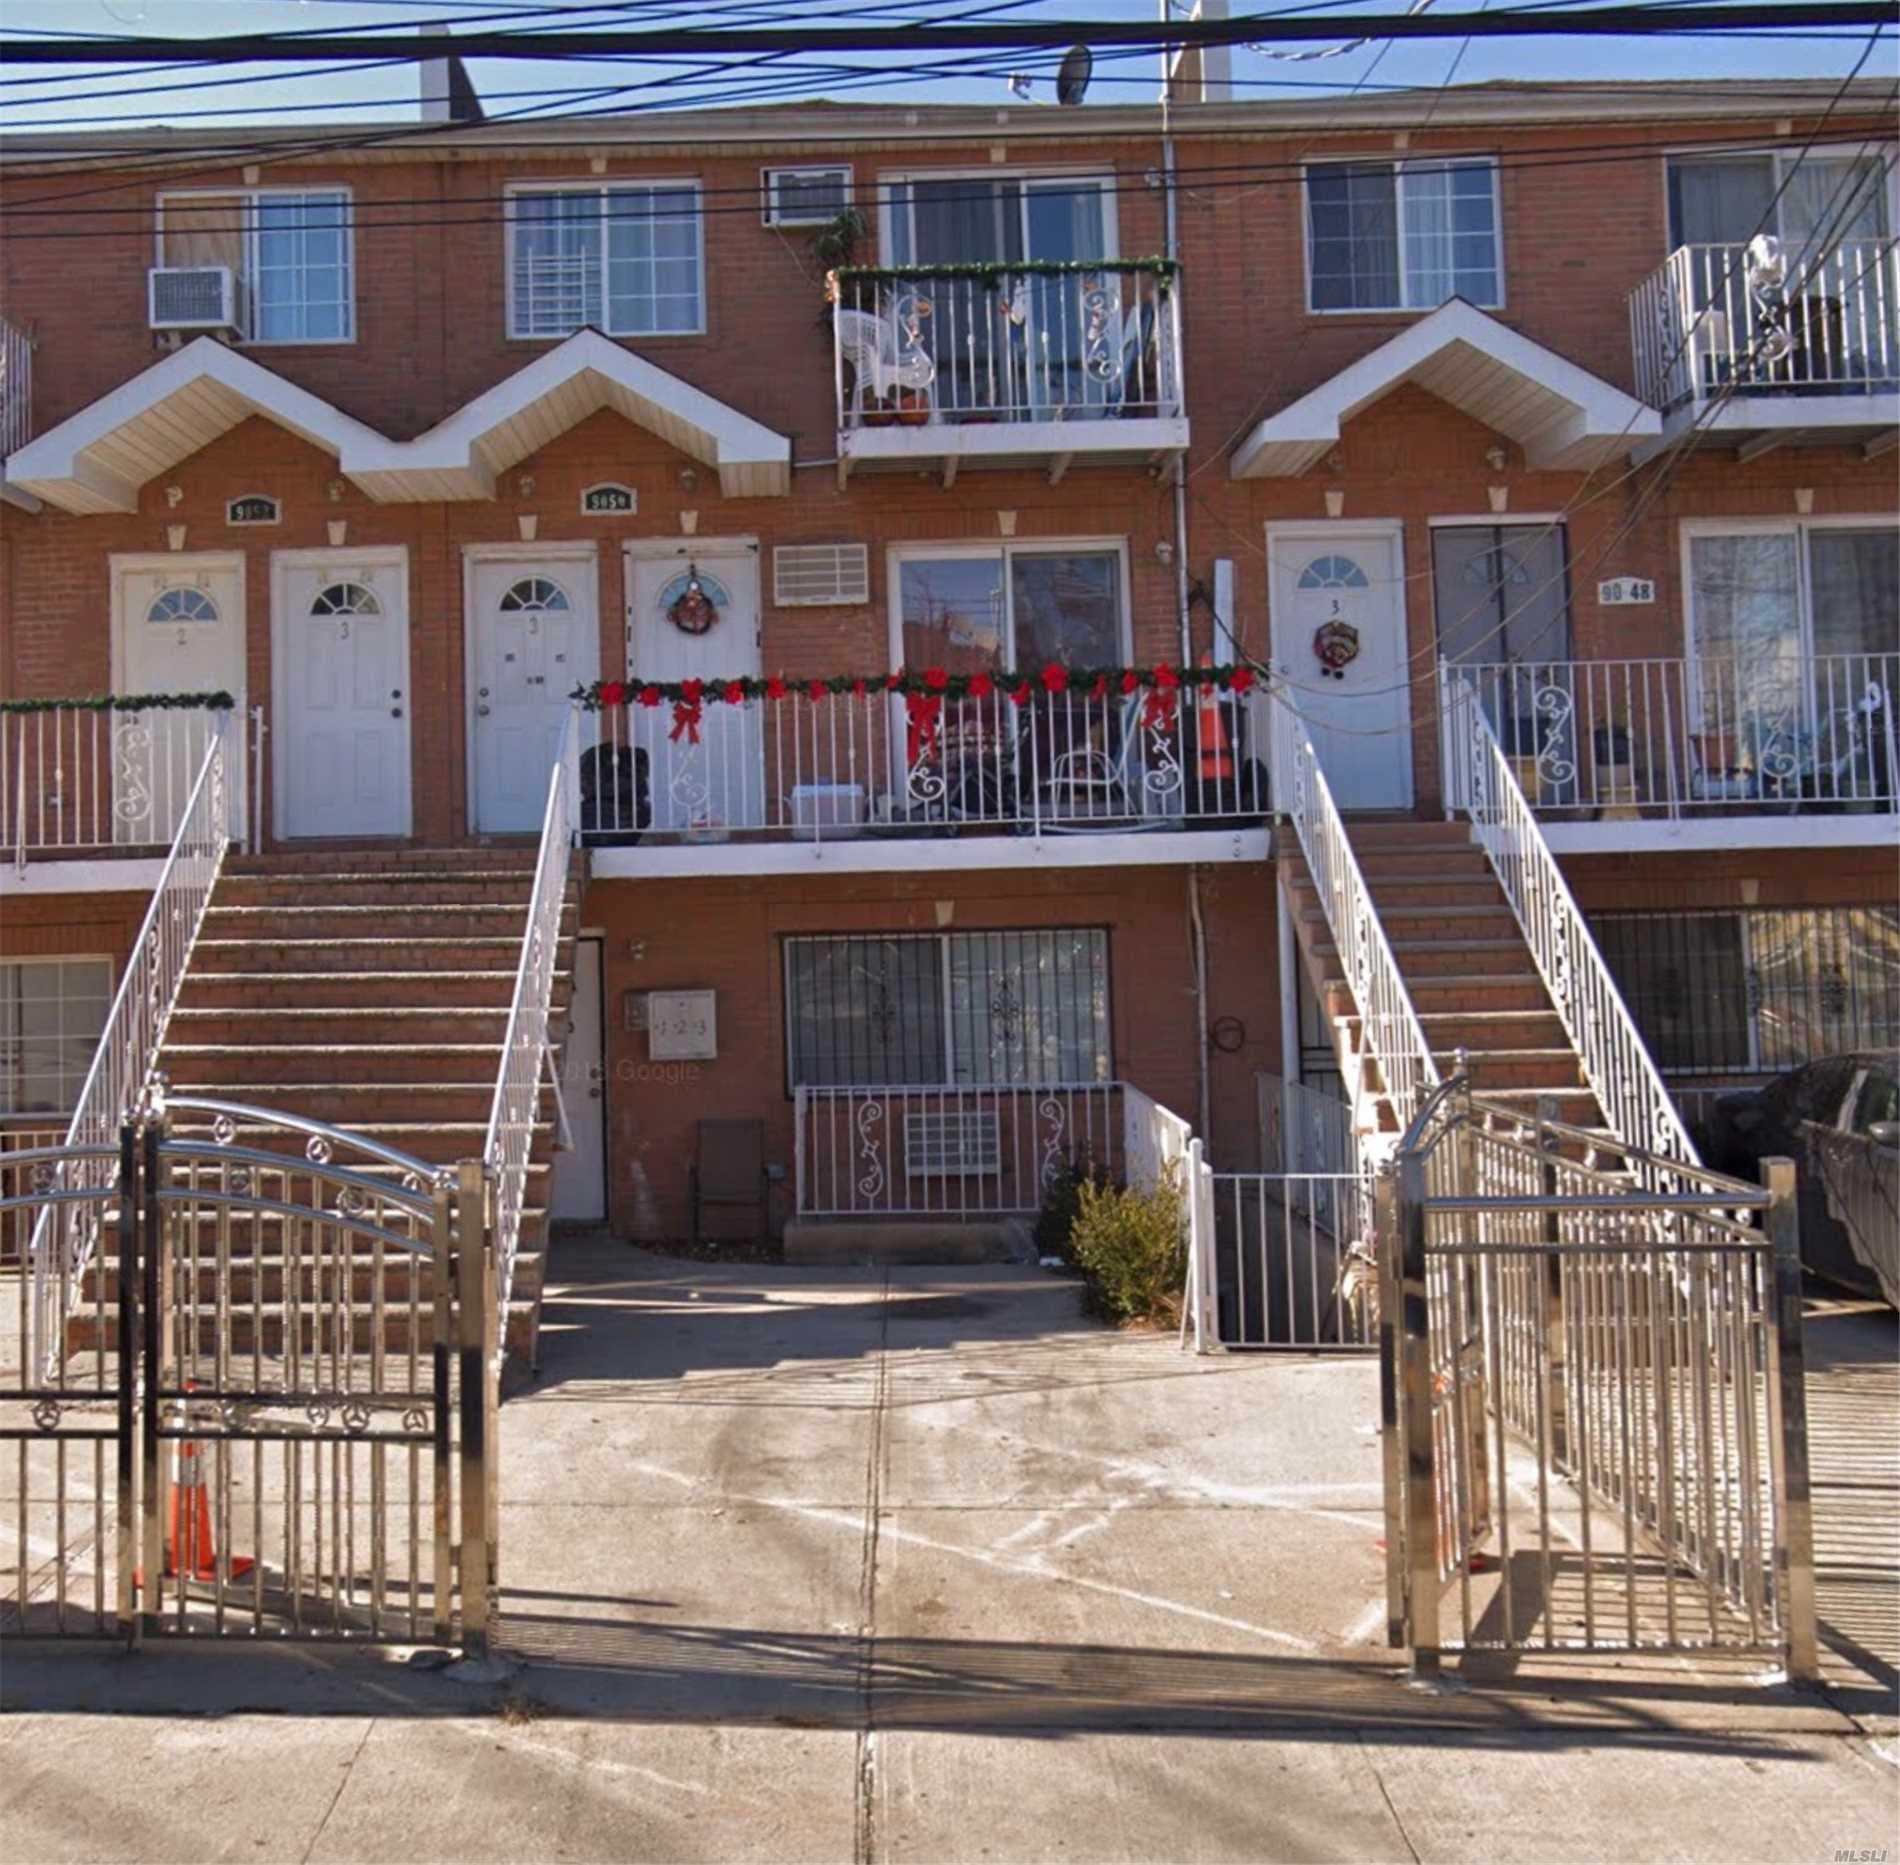 90-50 198 St, Hollis, NY 11423 (Off Market NYStateMLS